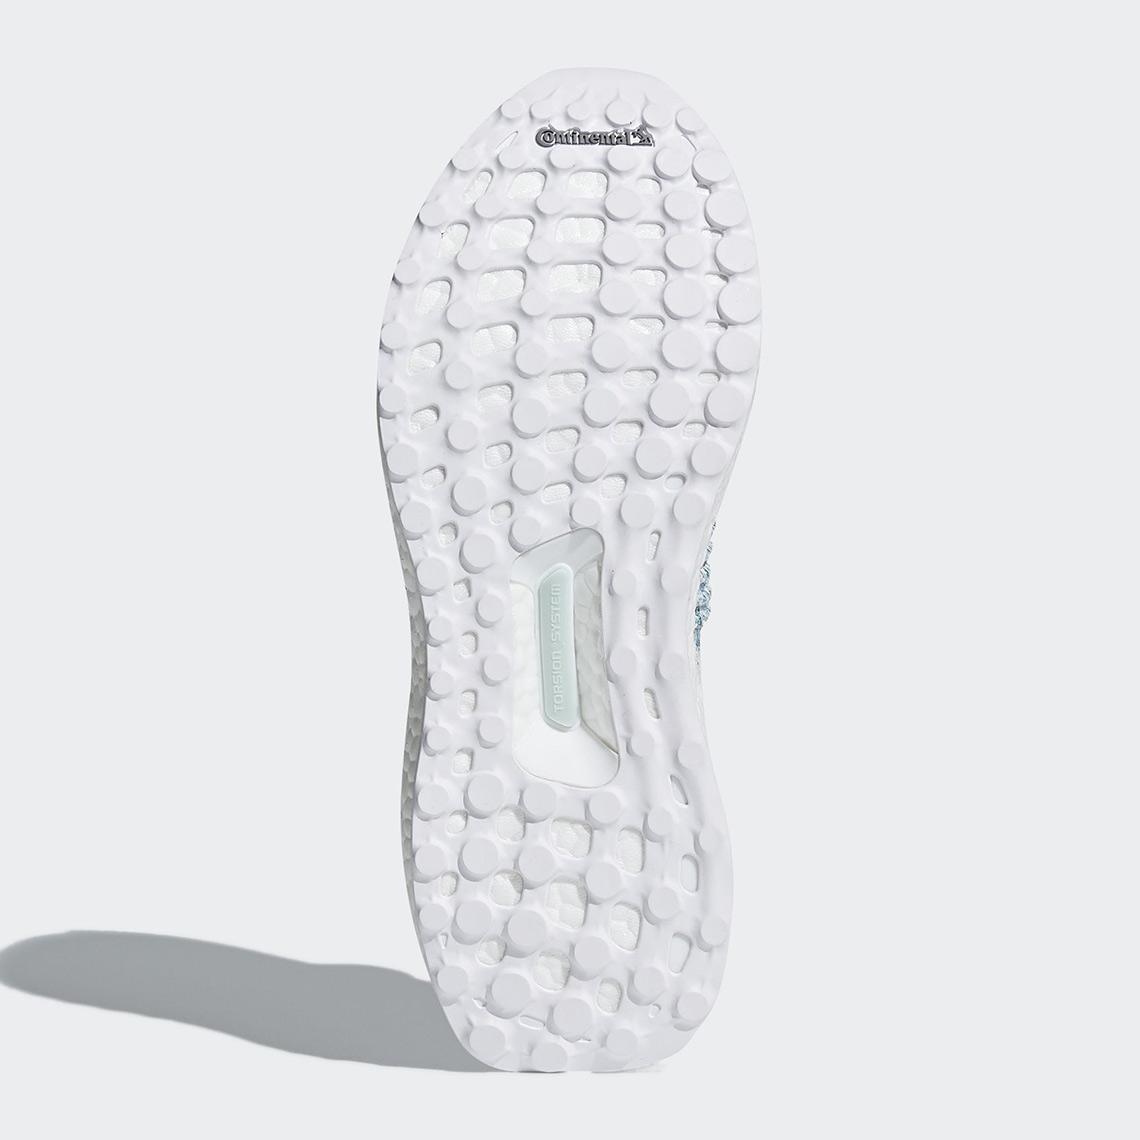 timeless design 59238 2ac40 adidas Ulltra BOOST Laceless Release Info | SneakerNews.com